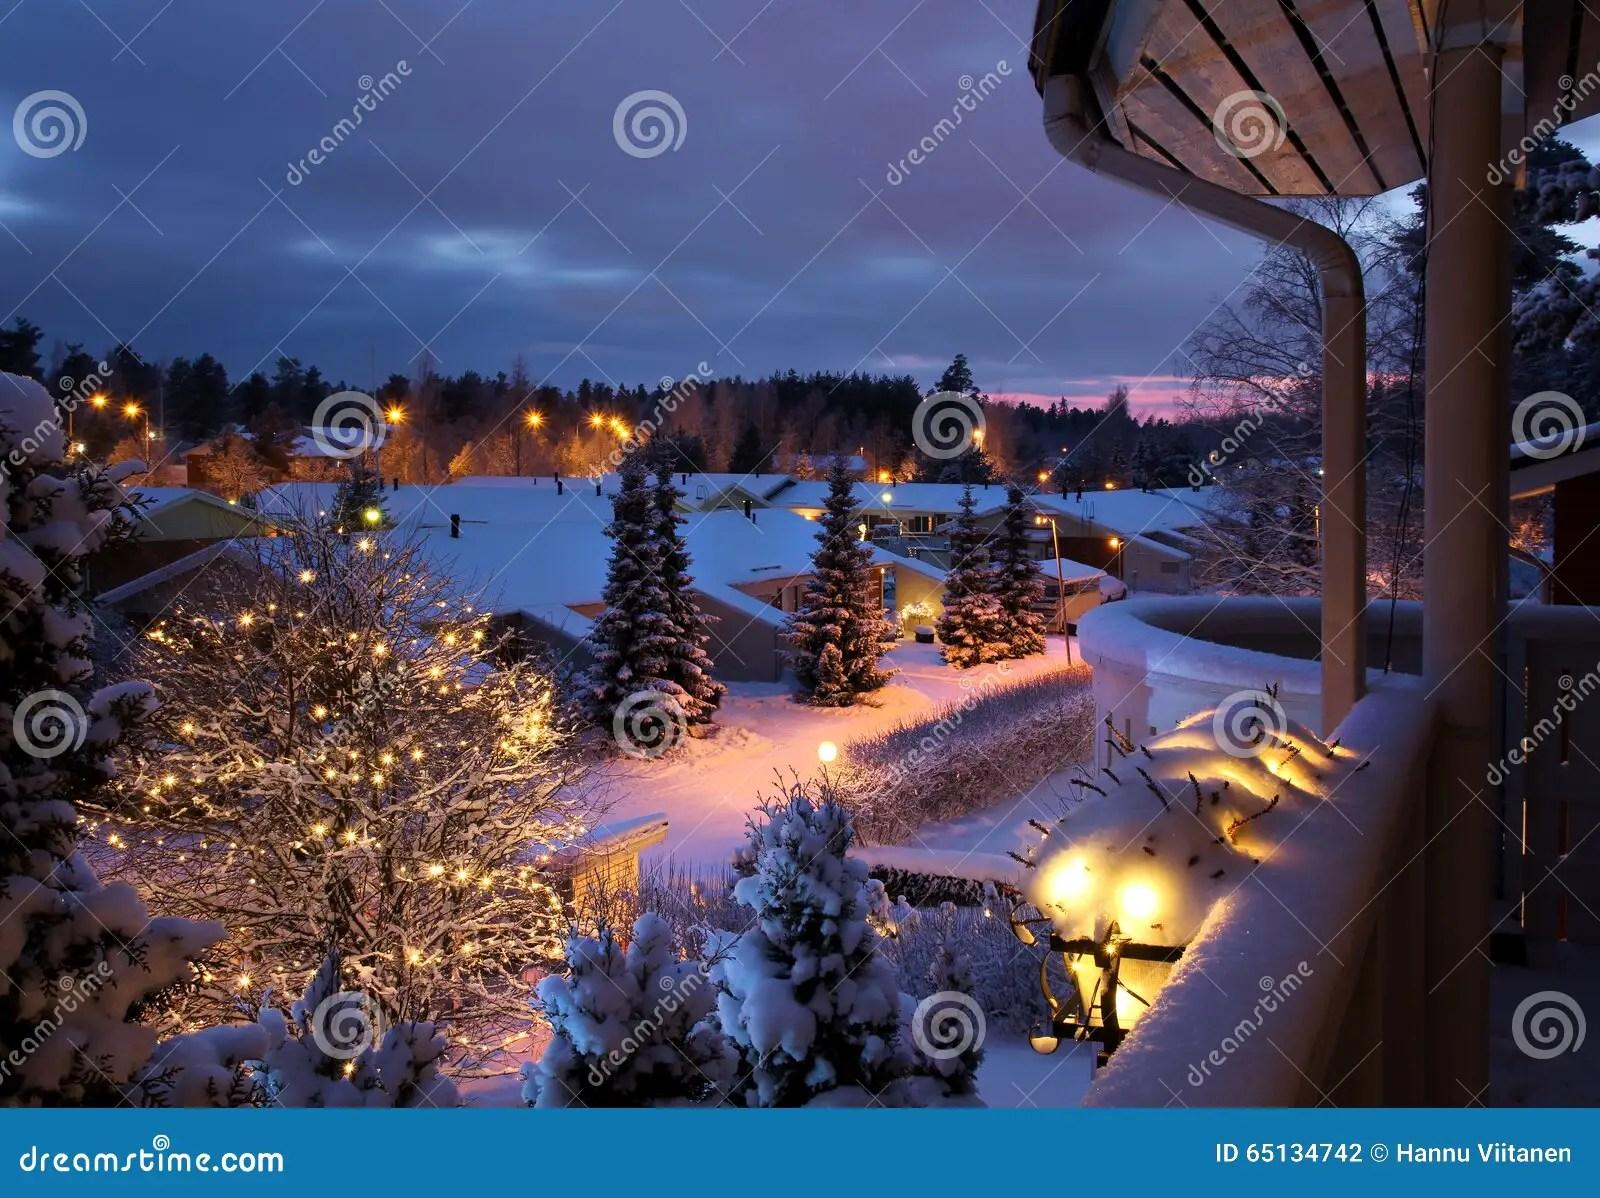 winter street snowy christmas